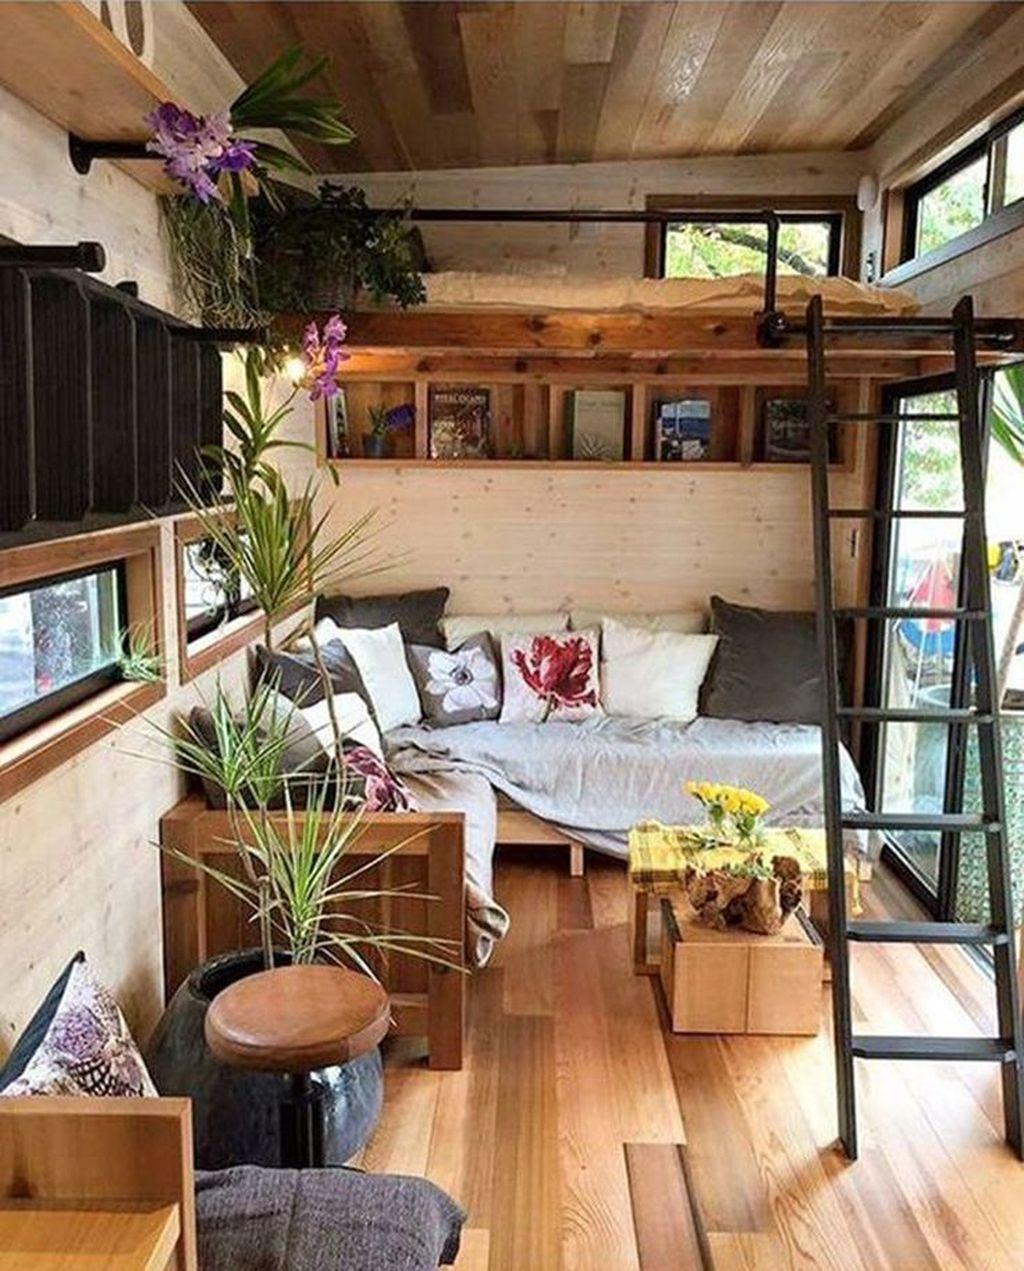 Home Design Ideas Handmade: 33 Gorgeous Tiny House Interior Design And Decor Ideas In